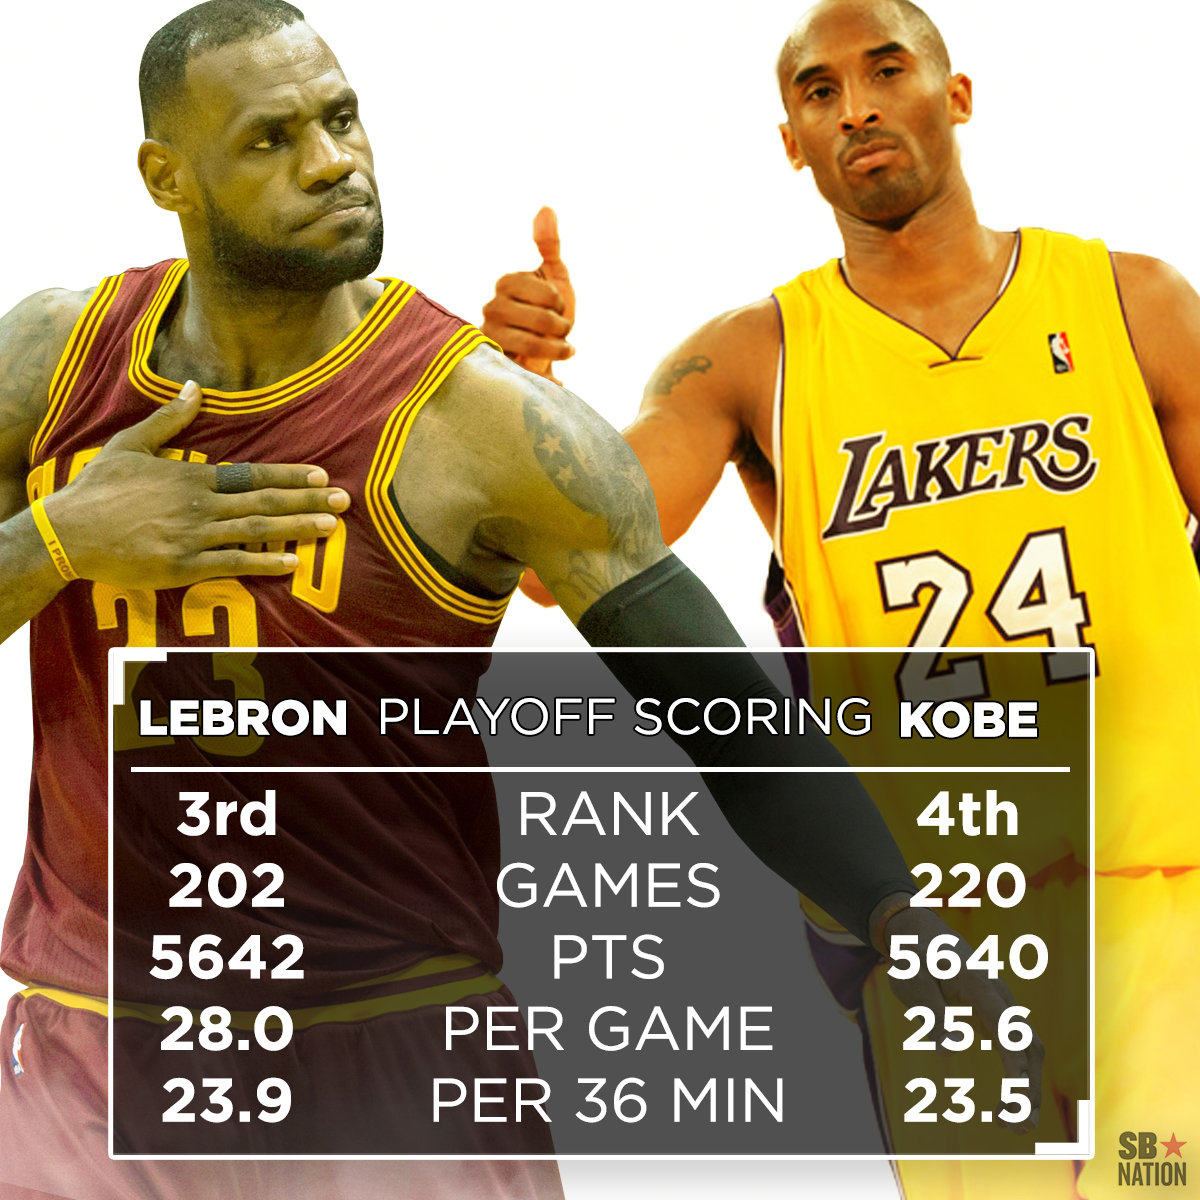 LeBron James Passed Kobe Bryant In Playoff Scoring And